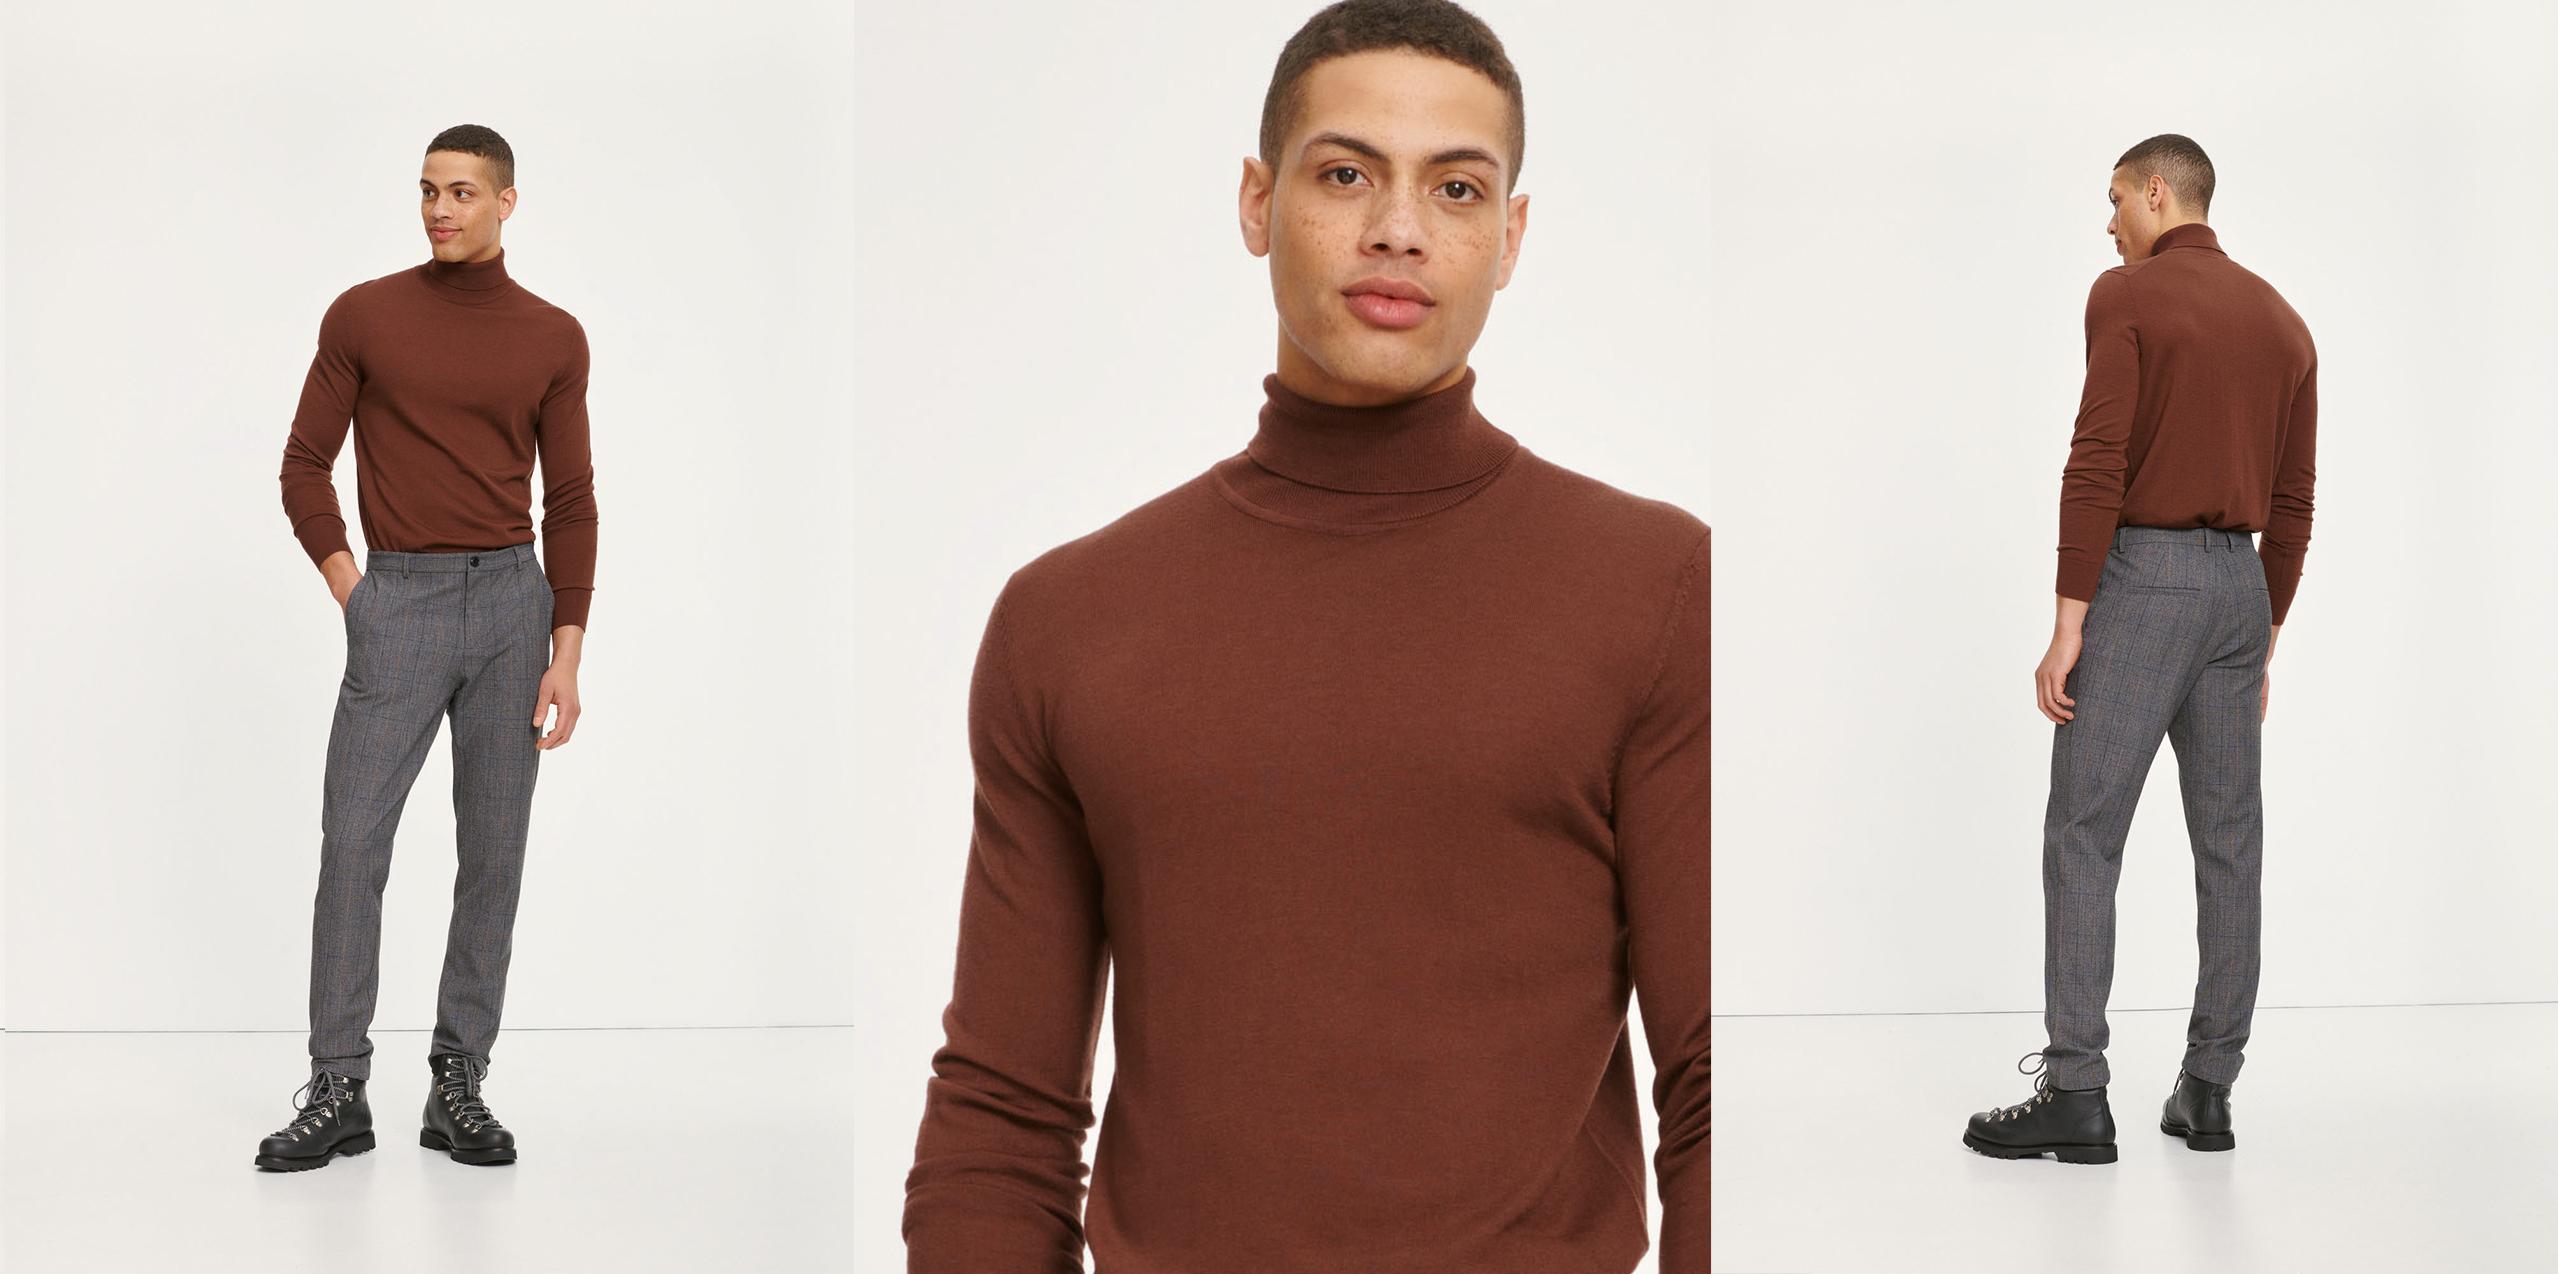 Flemming turtle neck 3111 Men's fashion